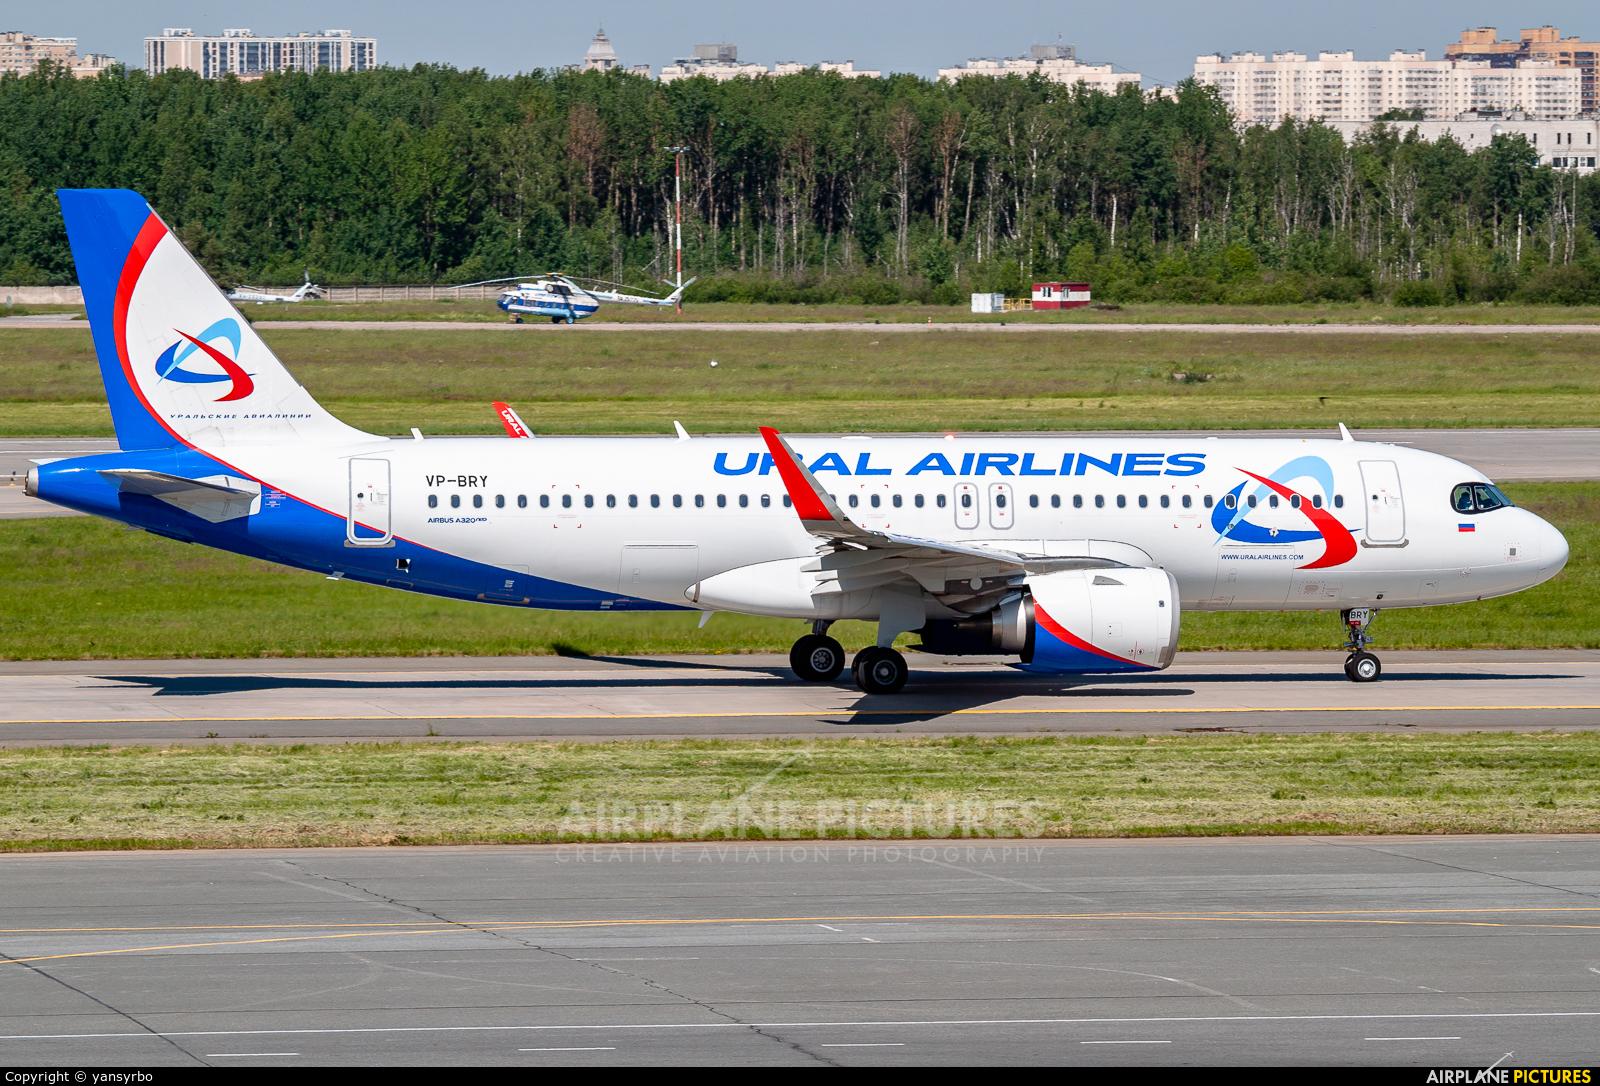 Ural Airlines VP-BRY aircraft at St. Petersburg - Pulkovo